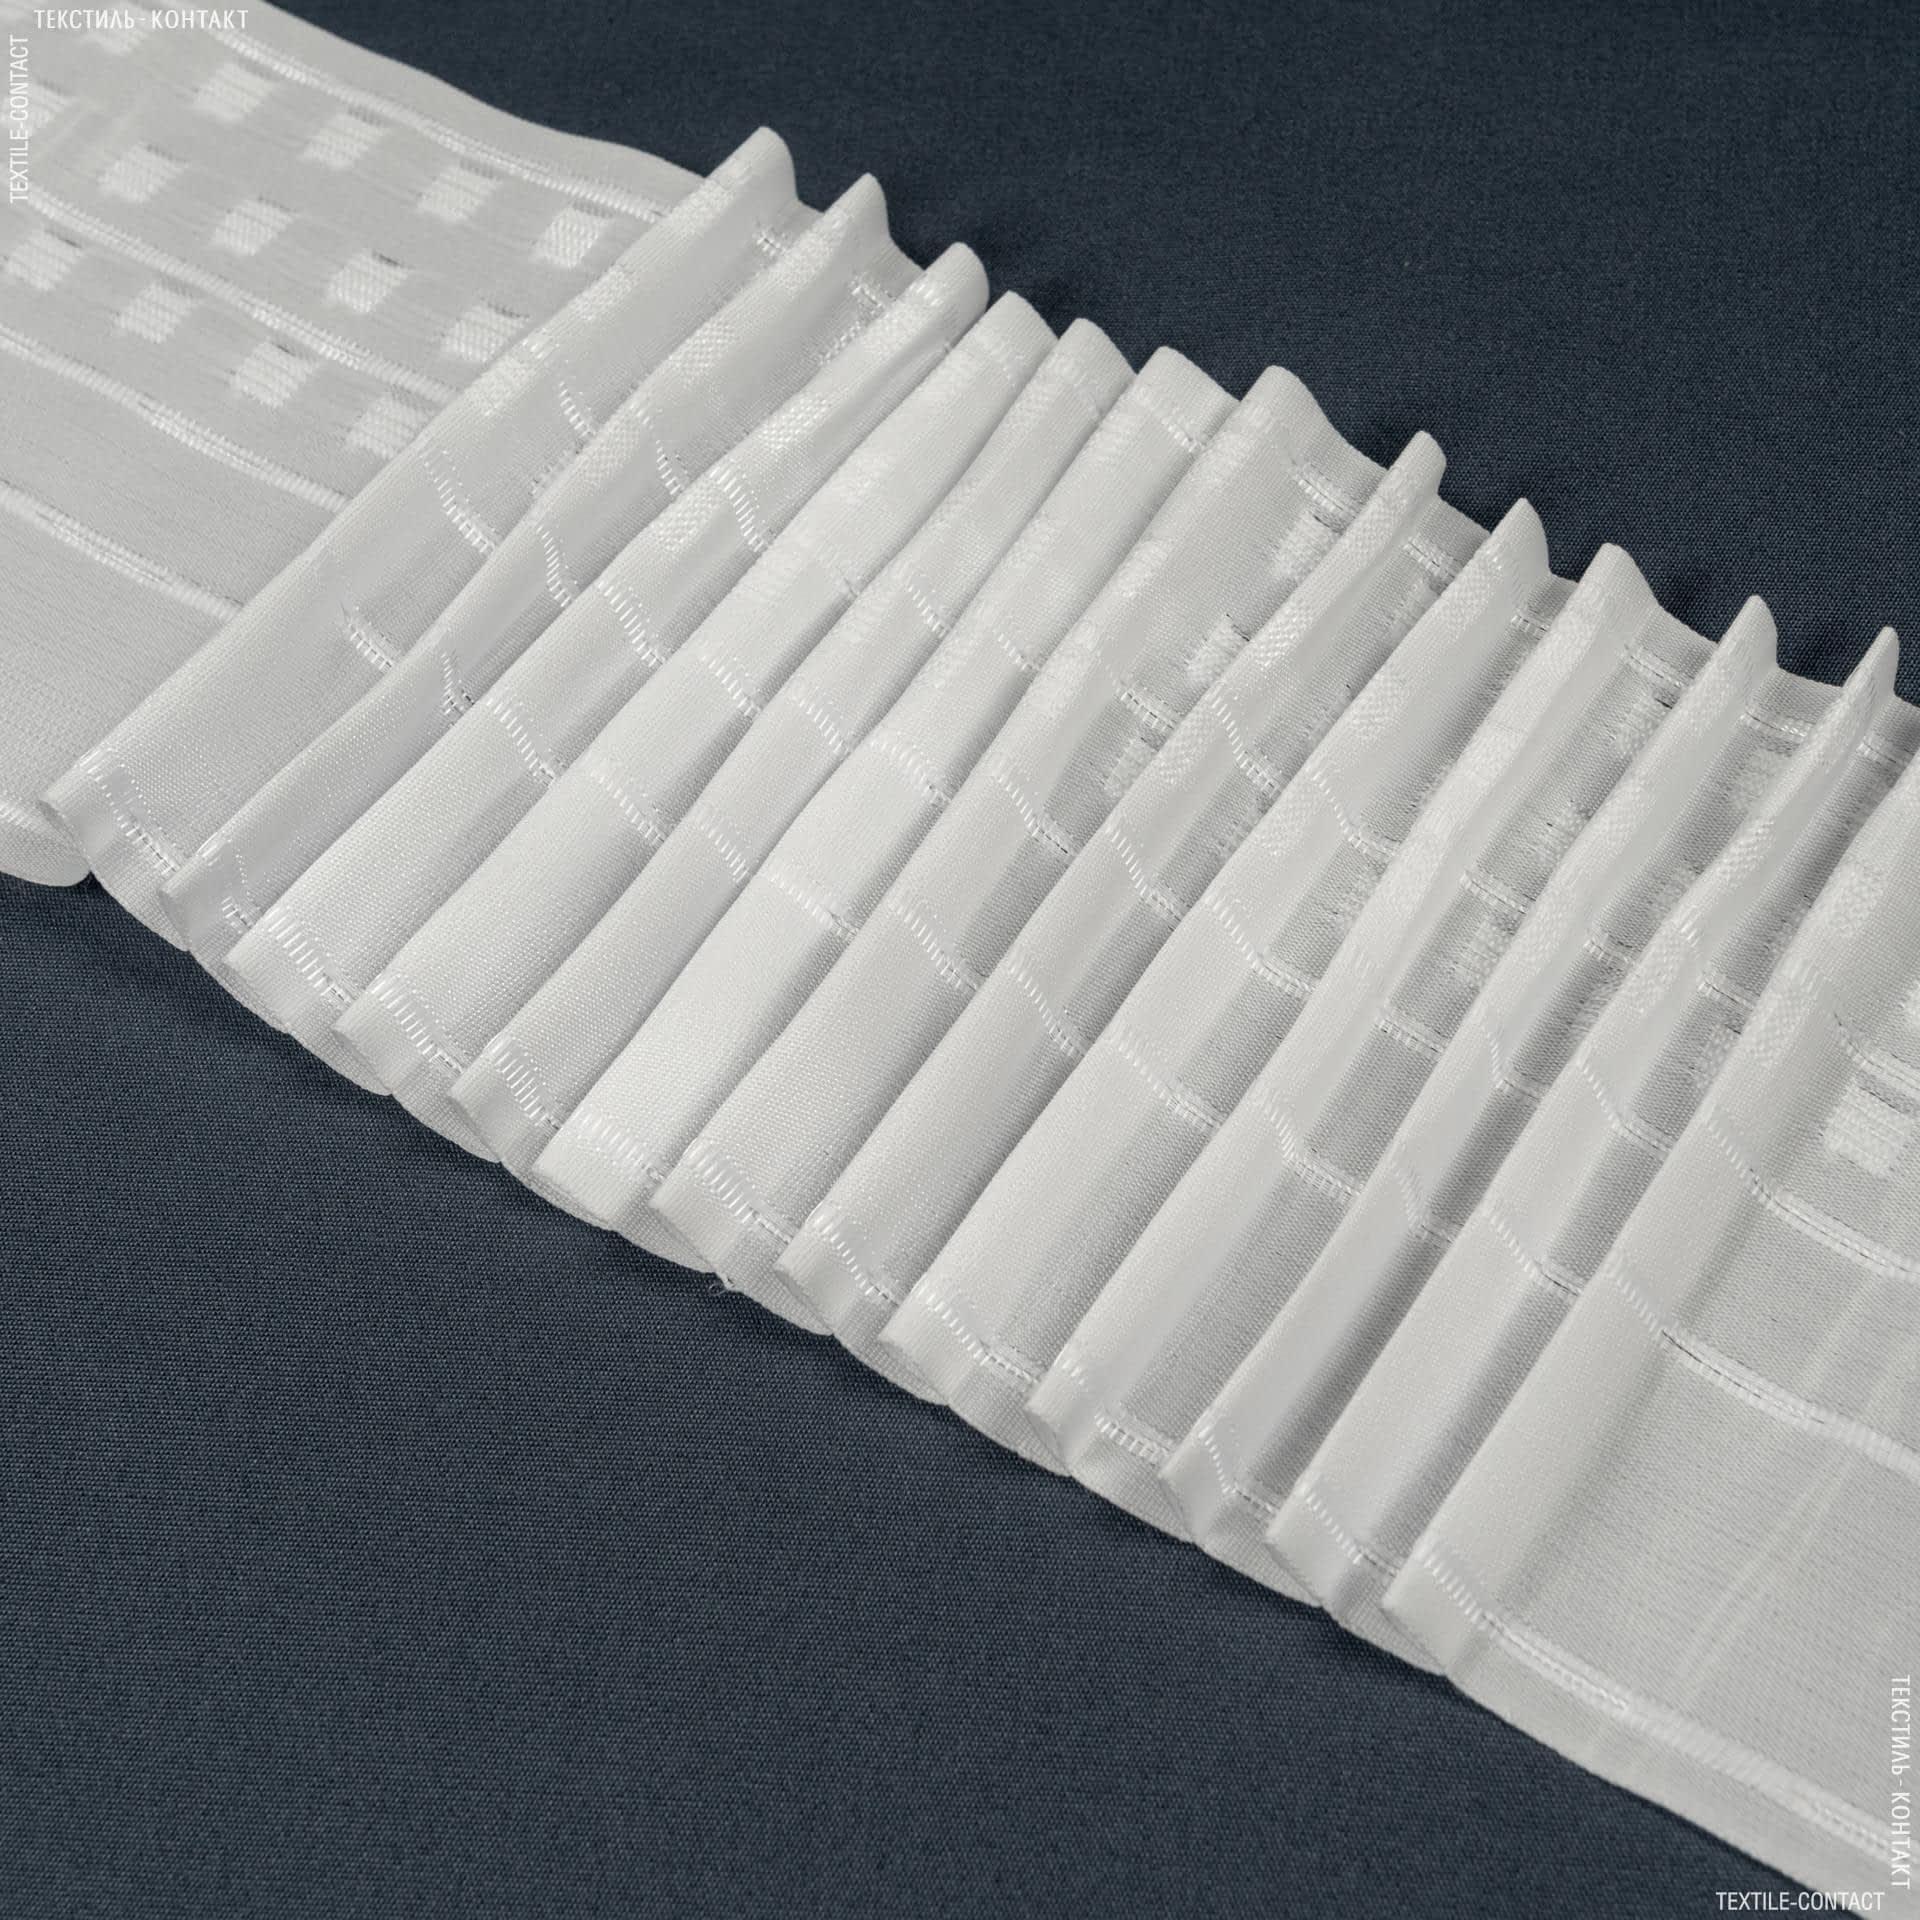 Ткани фурнитура для дома - ТЕСЬМА ШТОРНАЯ КС-1:2.5 170мм±0.5мм /50м матовая Равномерная